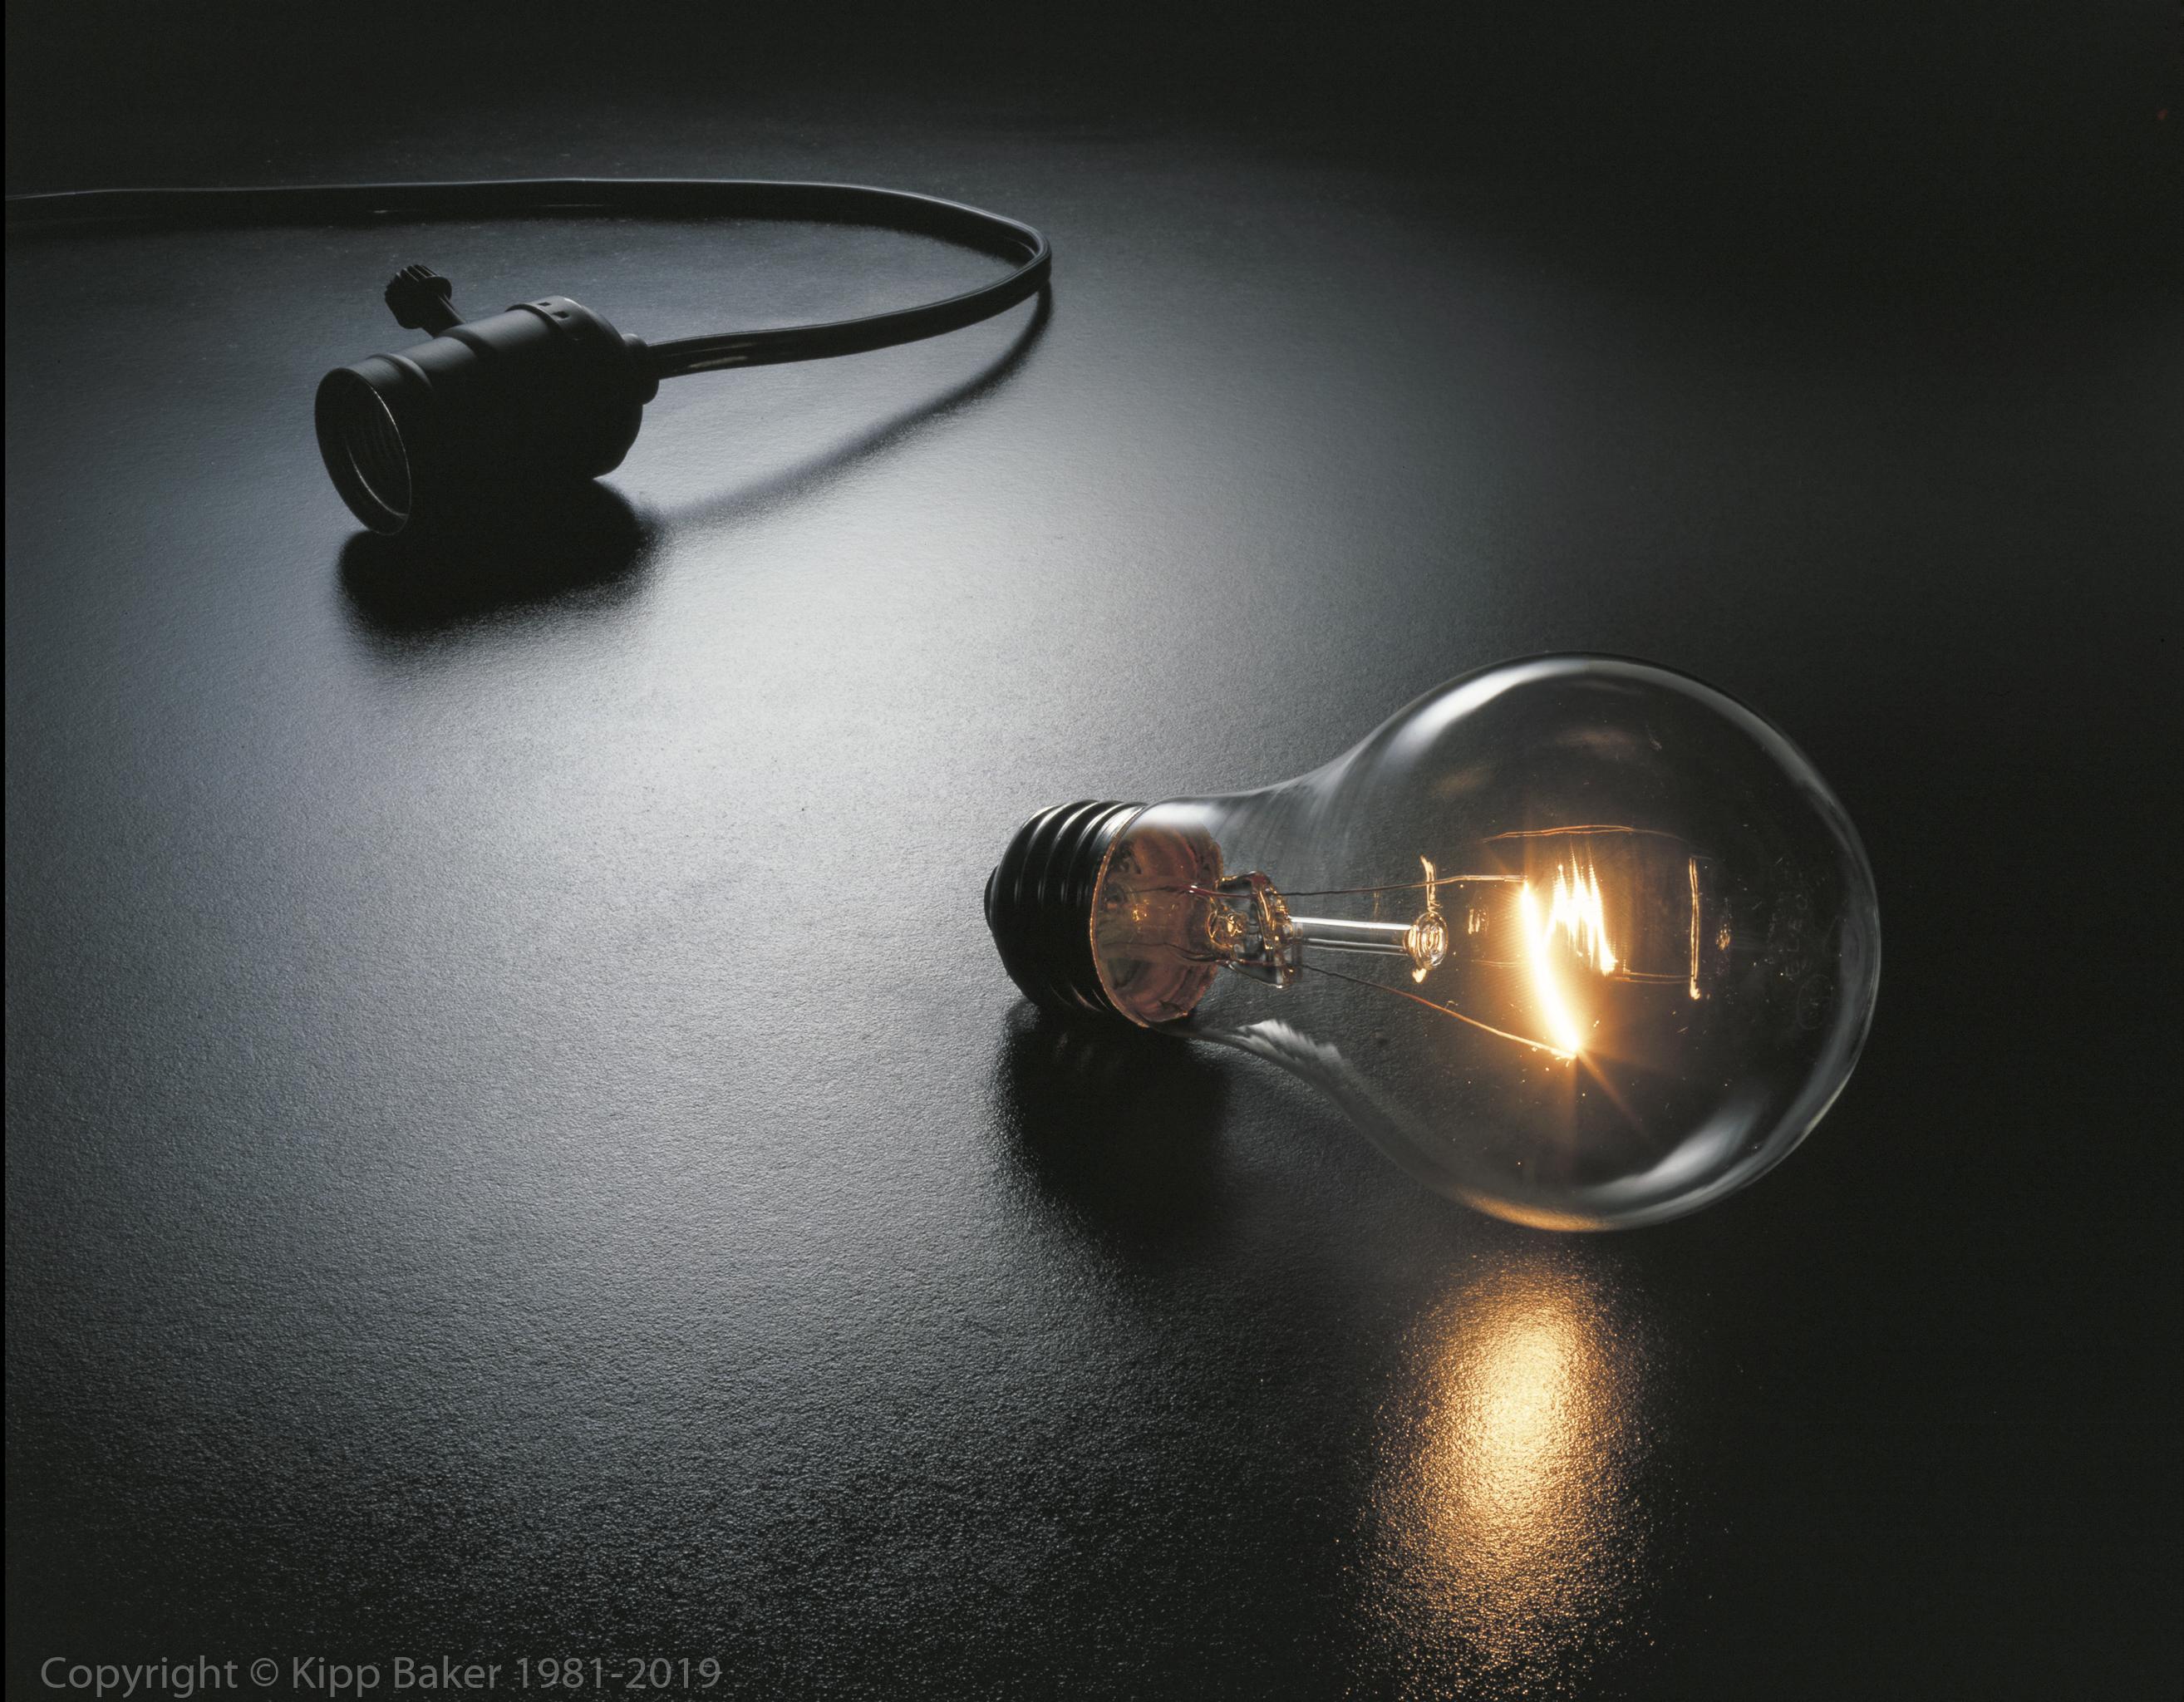 Light Bulb and socket (The Great Idea)